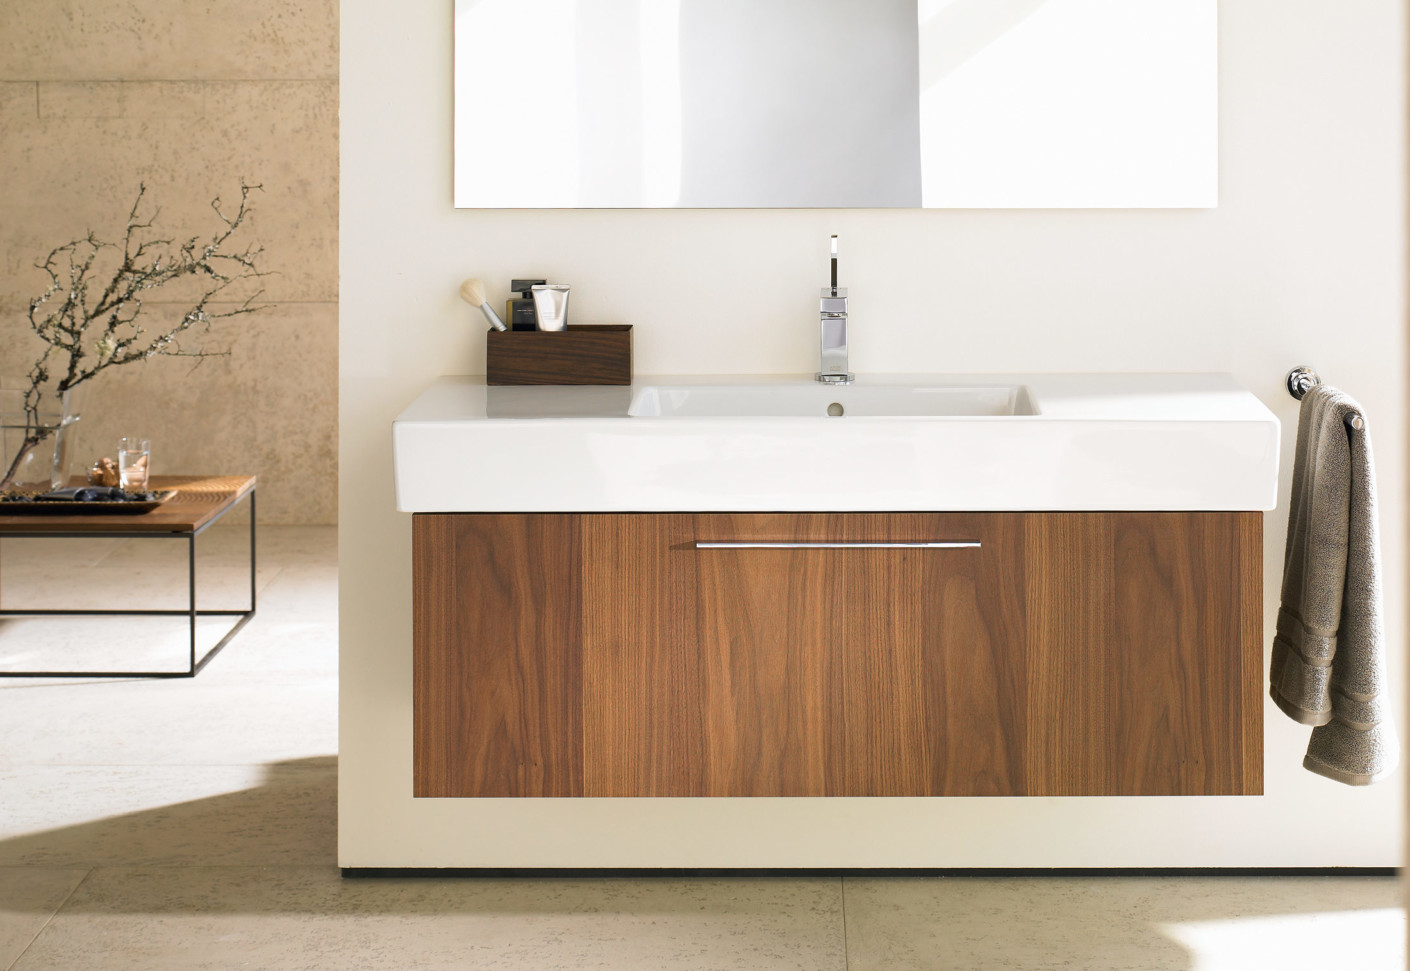 Fogo Vanity unit by Duravit   STYLEPARK. Vanity Sink Units For Bathrooms. Home Design Ideas